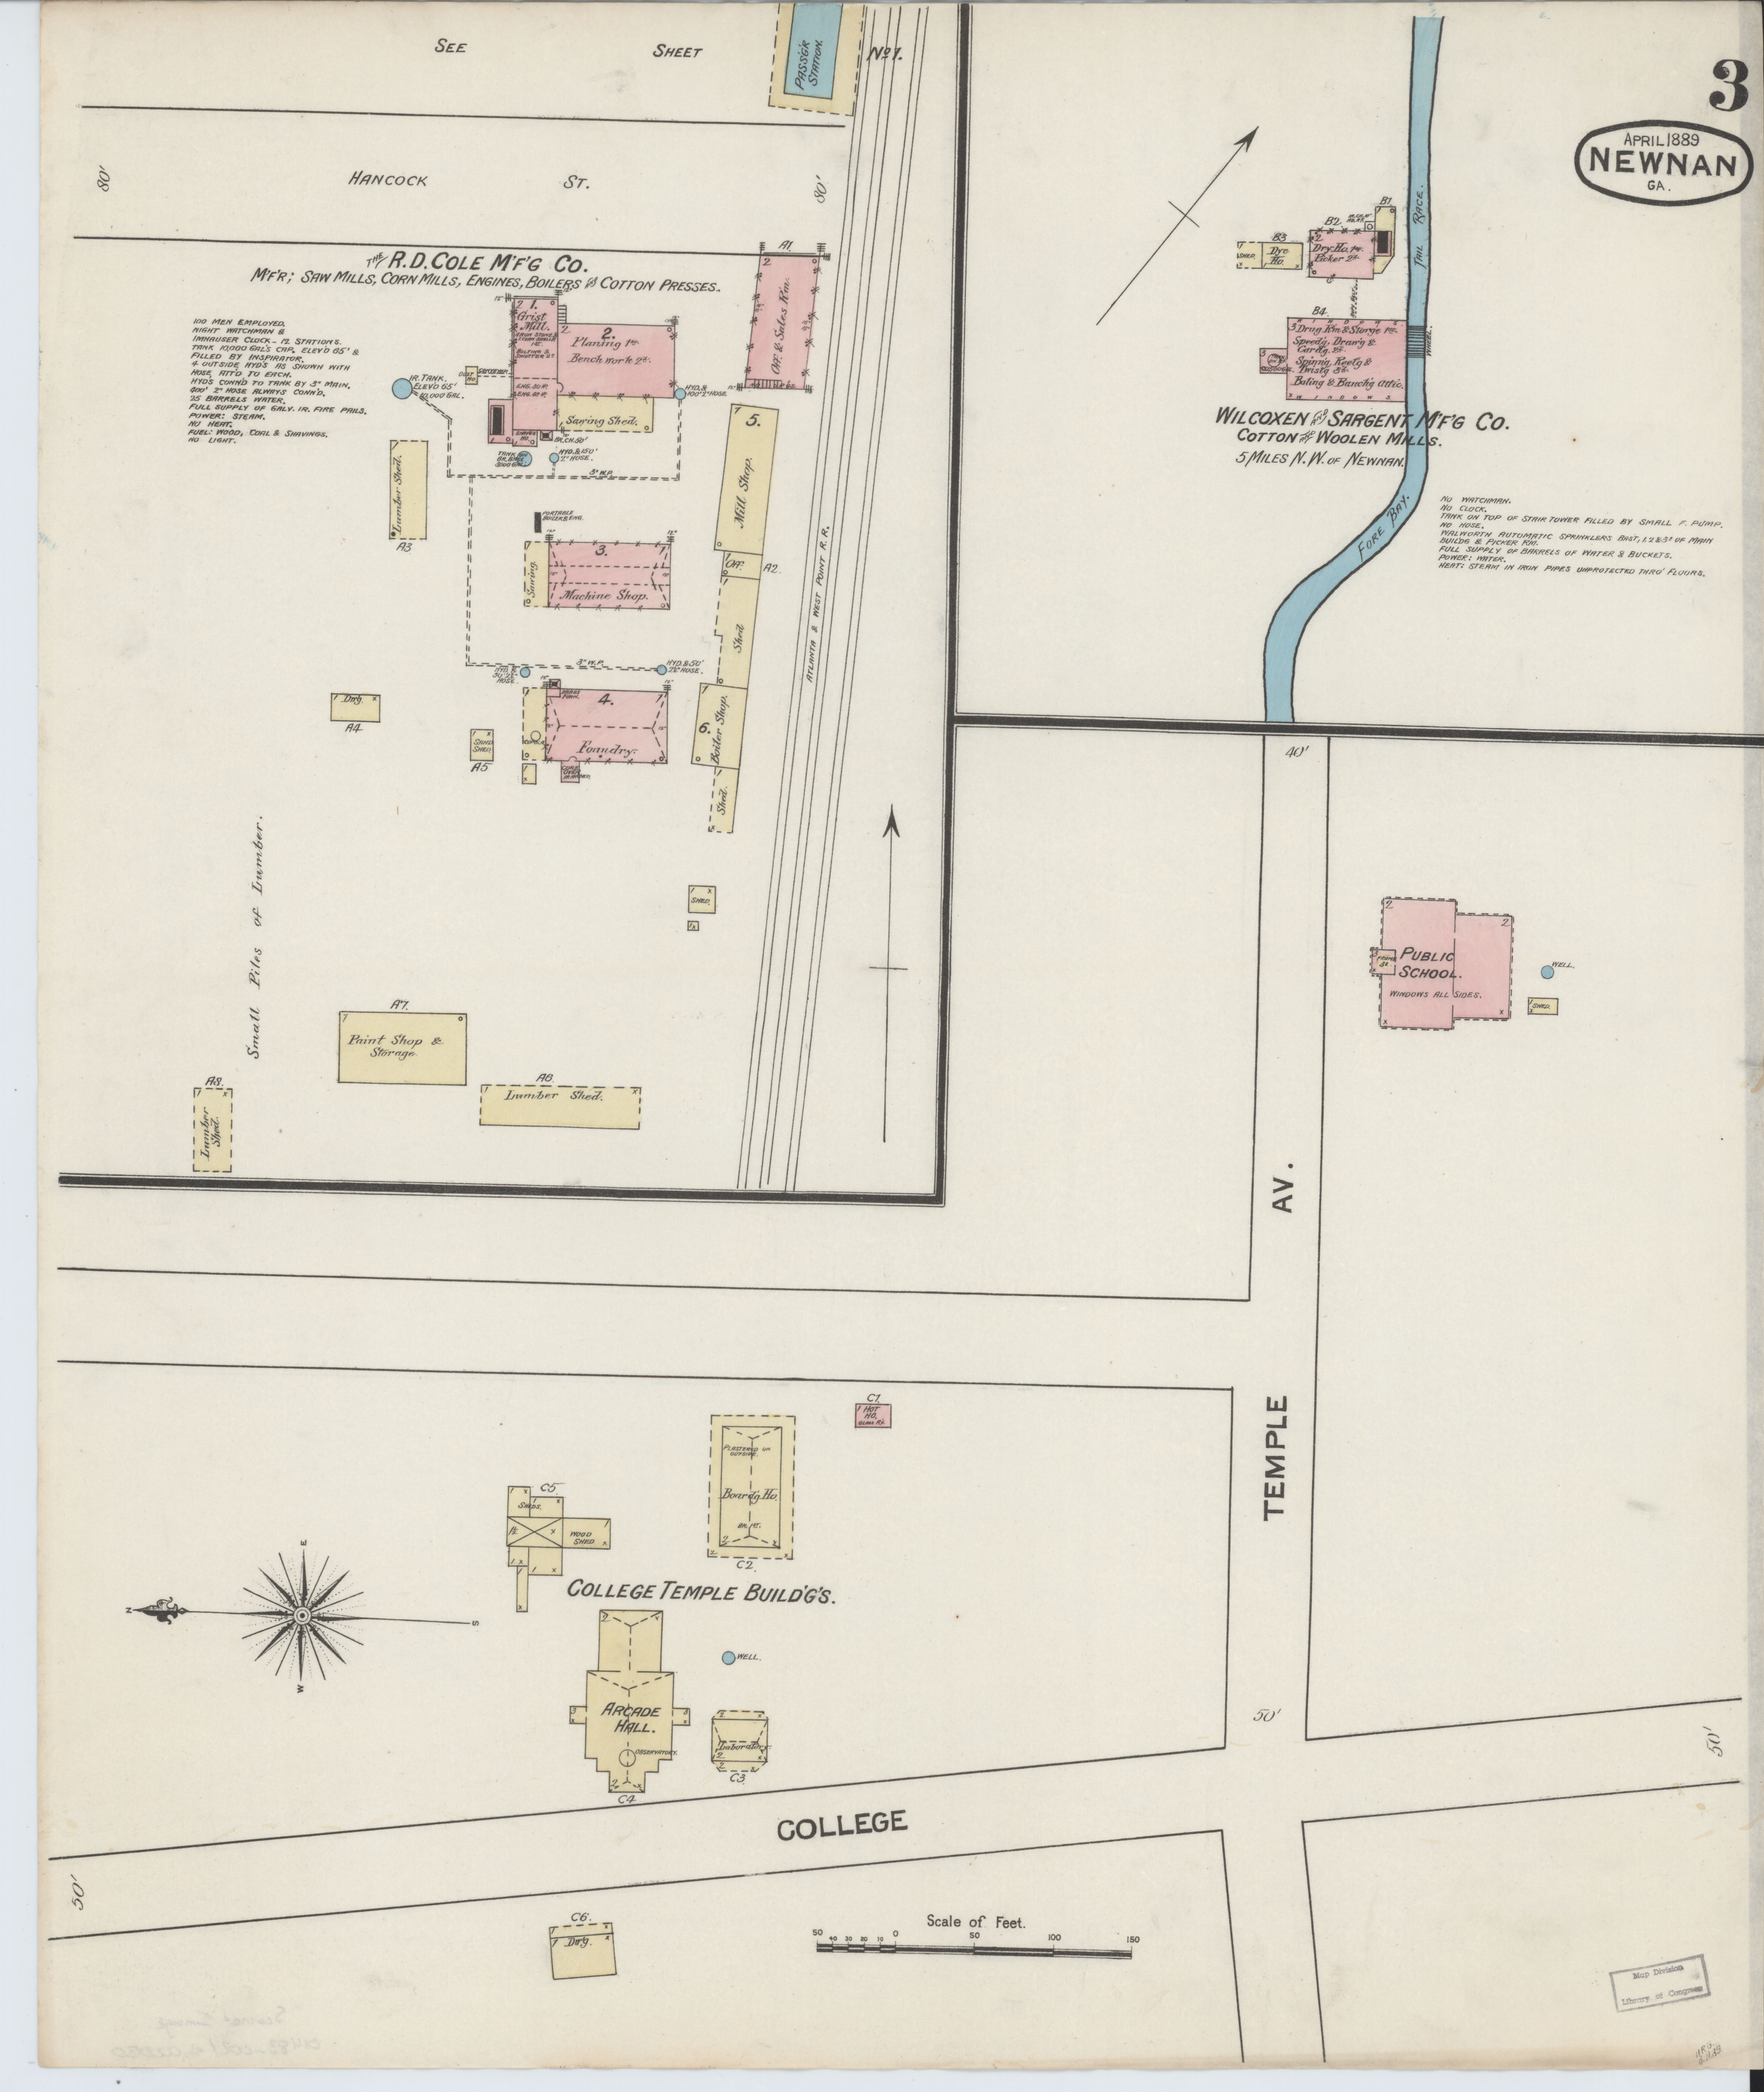 Newnan Georgia Map.File Sanborn Fire Insurance Map From Newnan Coweta County Georgia